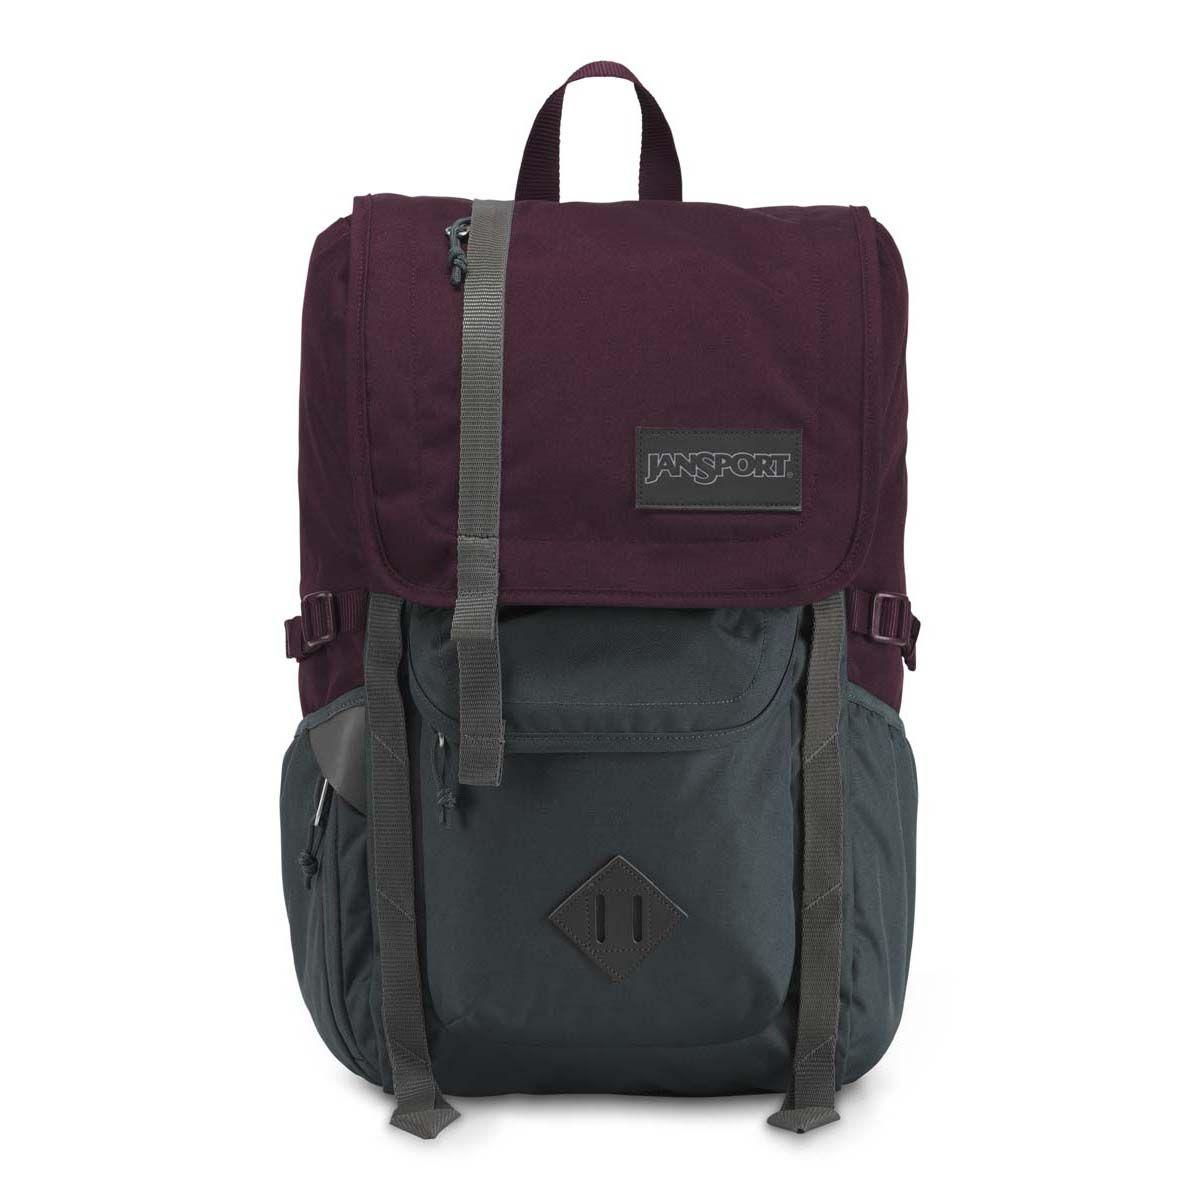 JanSport Hatchet Backpack in Dried Fig/Grey Horizon